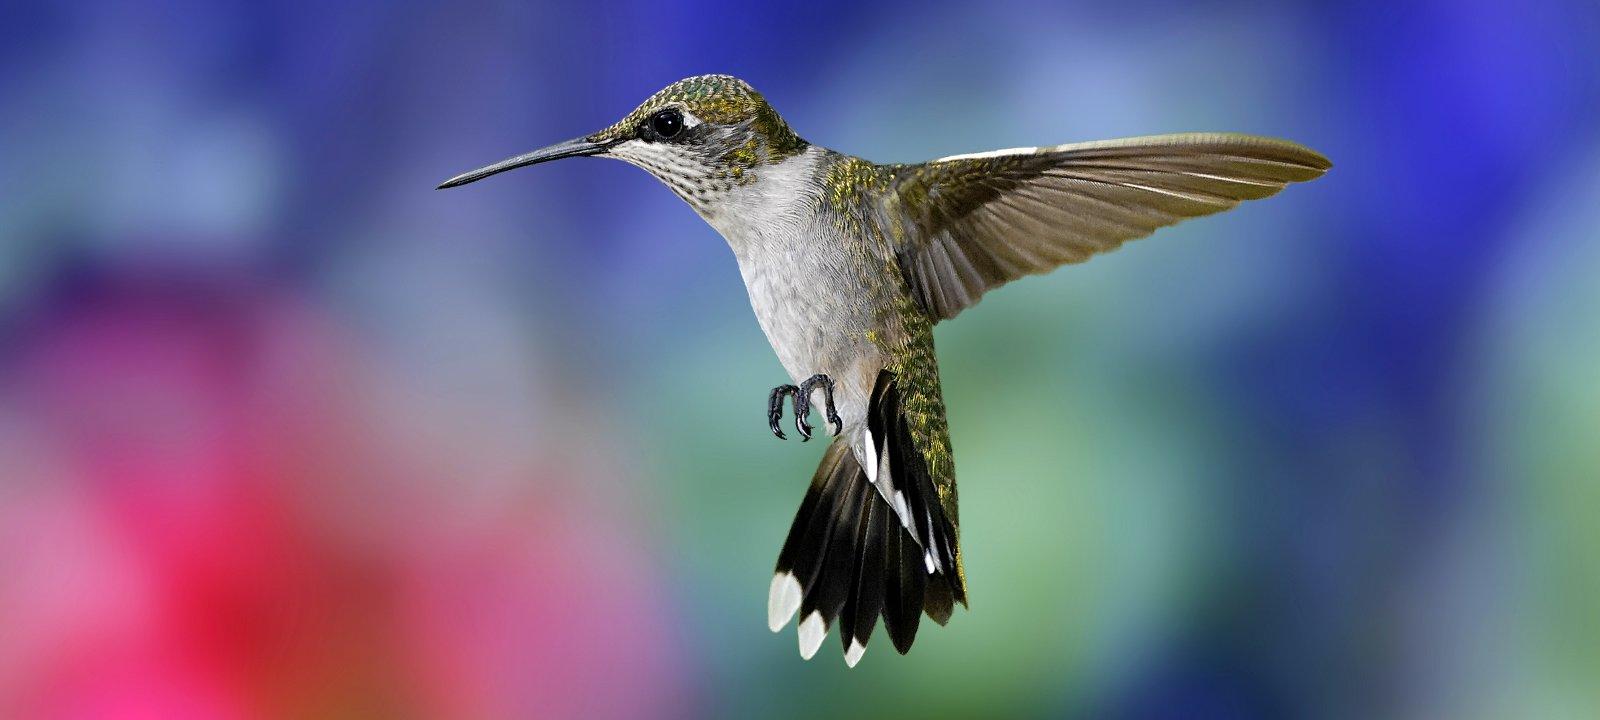 Колибри: фото птицы, внешний вид, описание, особенности